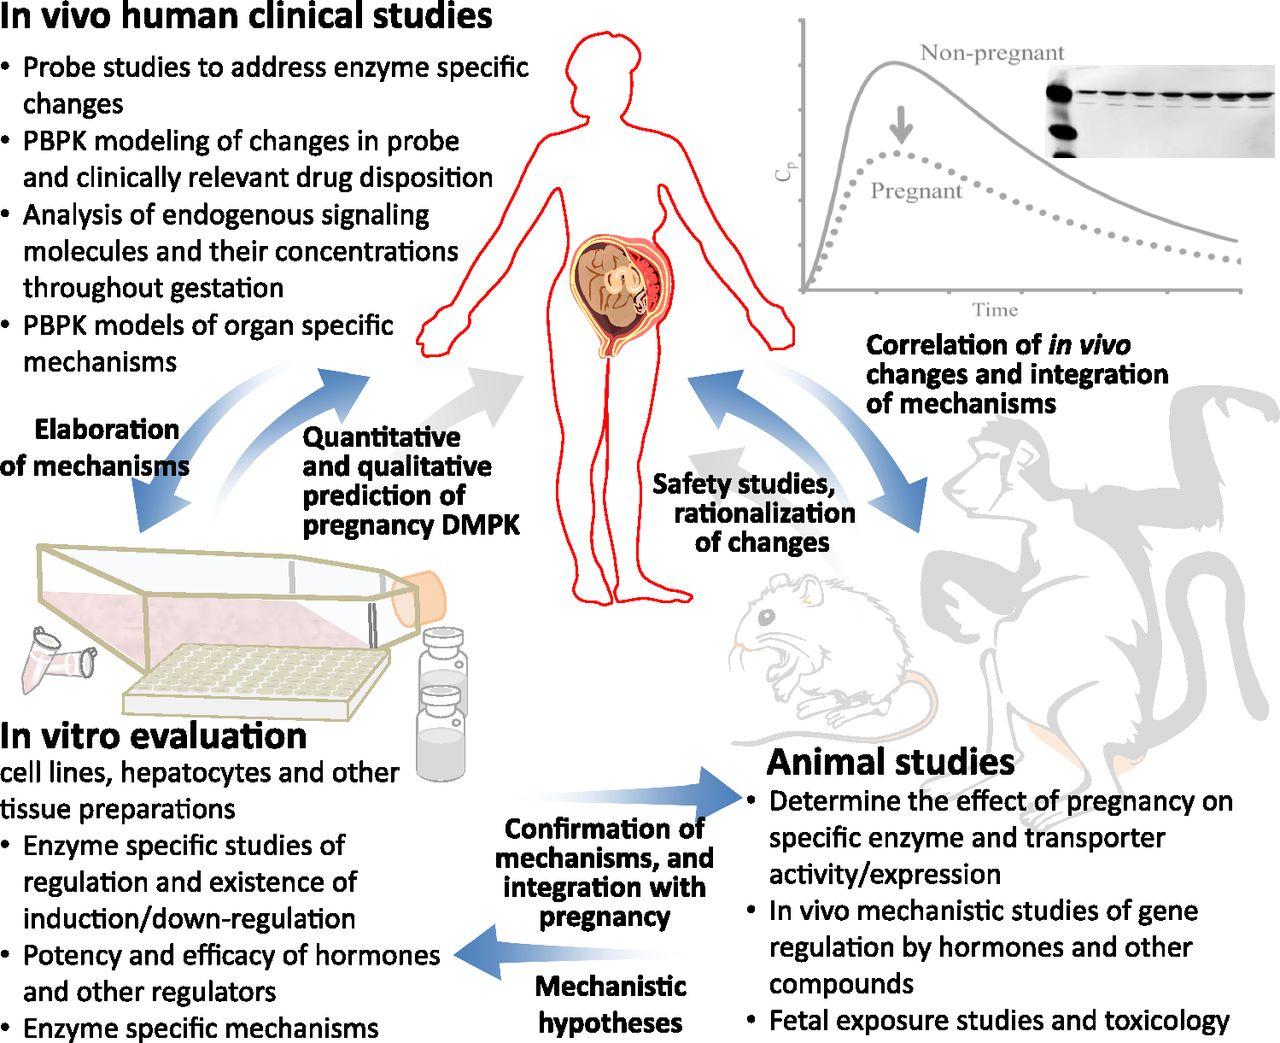 Drug Metabolism and Transport During Pregnancy: How Does